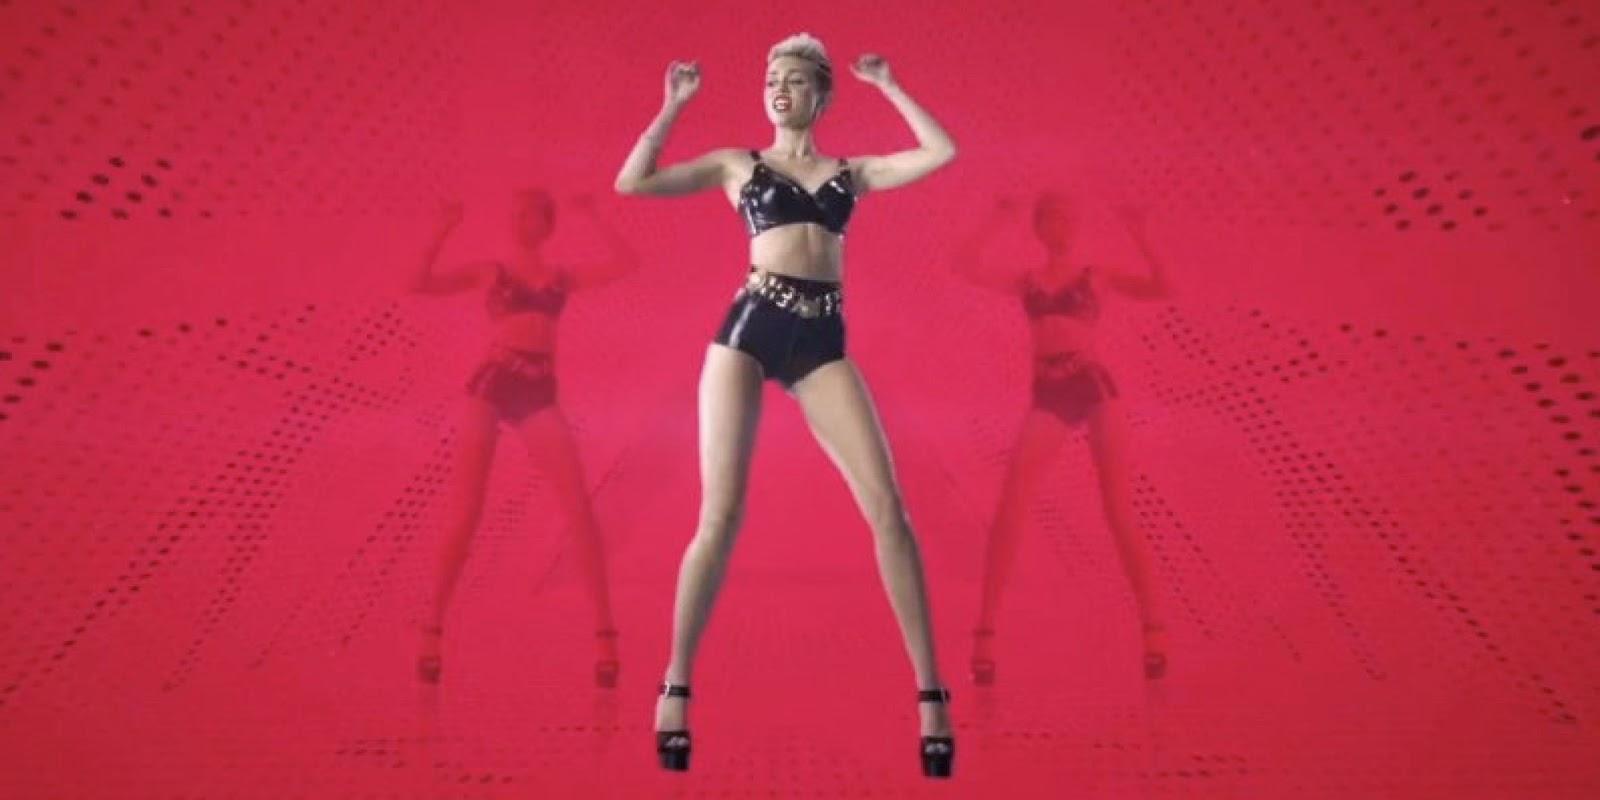 The same Miley cyrus gettin fucked